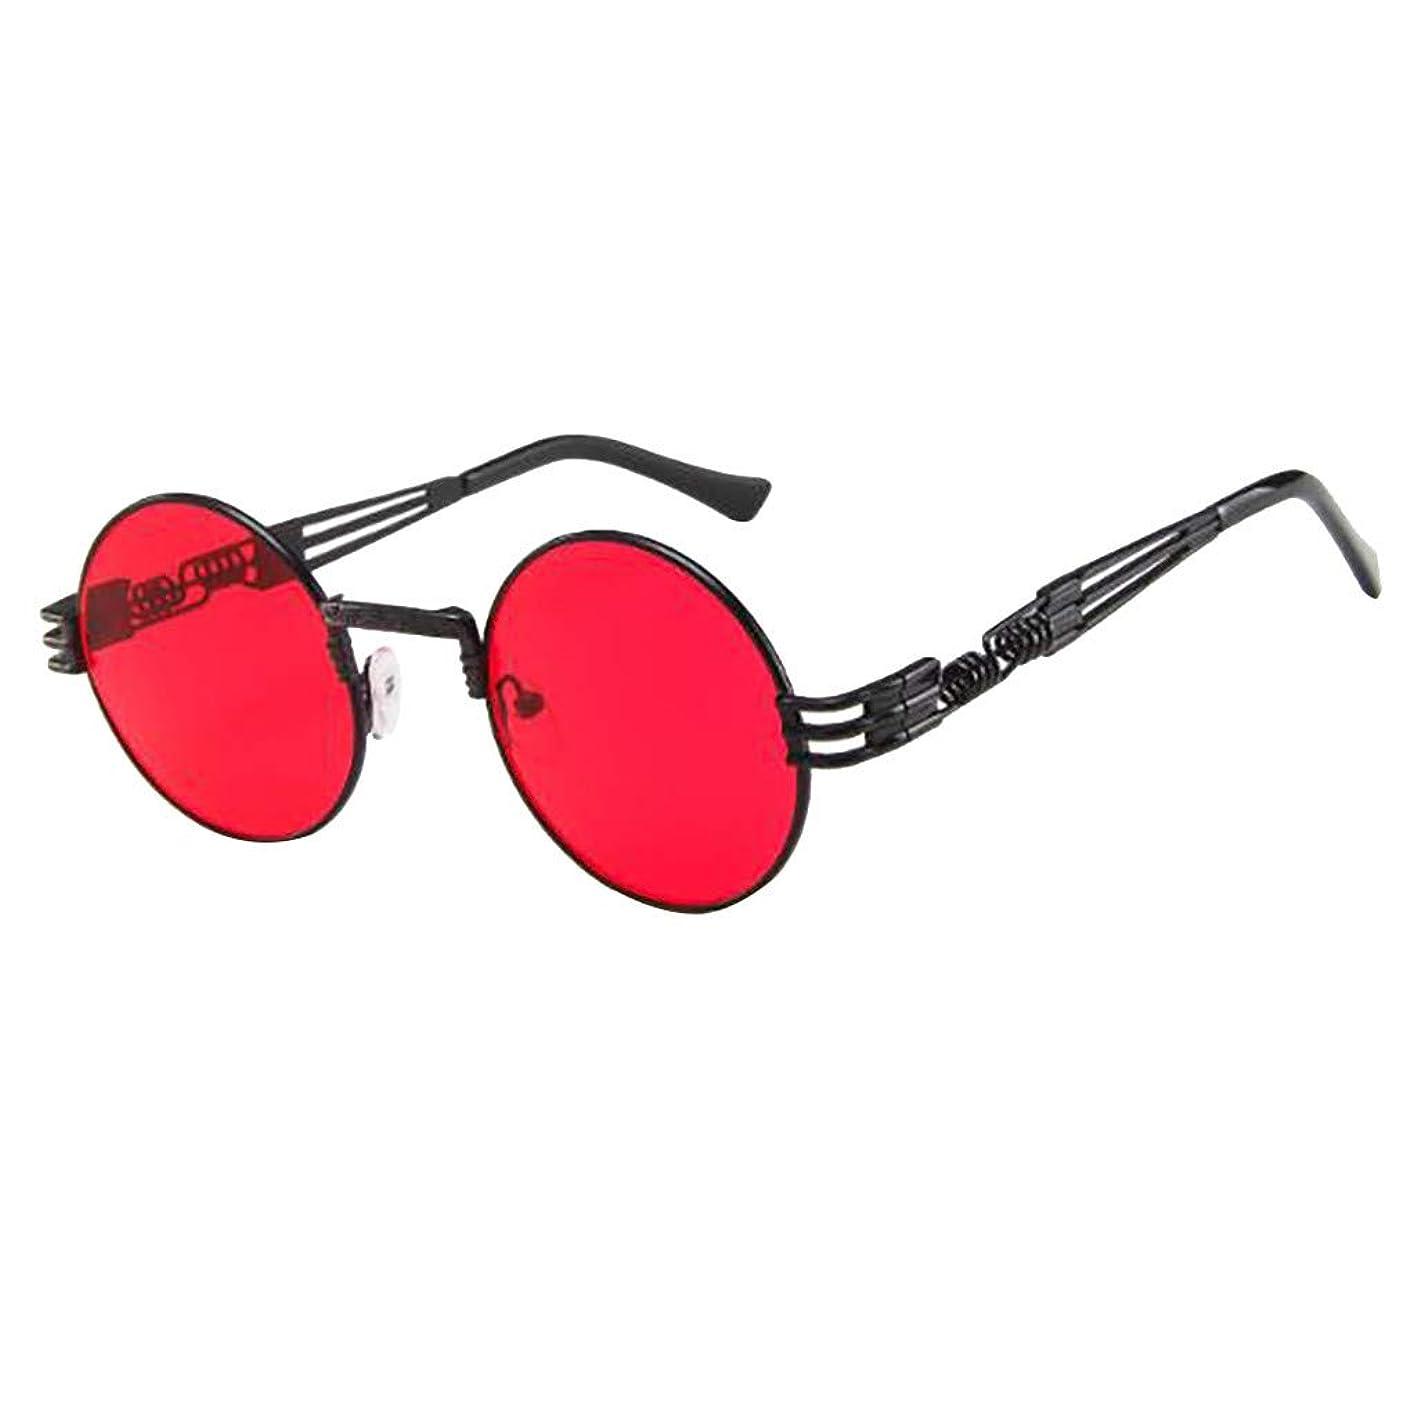 NOMENI Vintage Classic Round Glasses Metal Frame Eyewear Clear Lens Transparent Glasses - Round Ultrathin Metal hcebaibfegn035